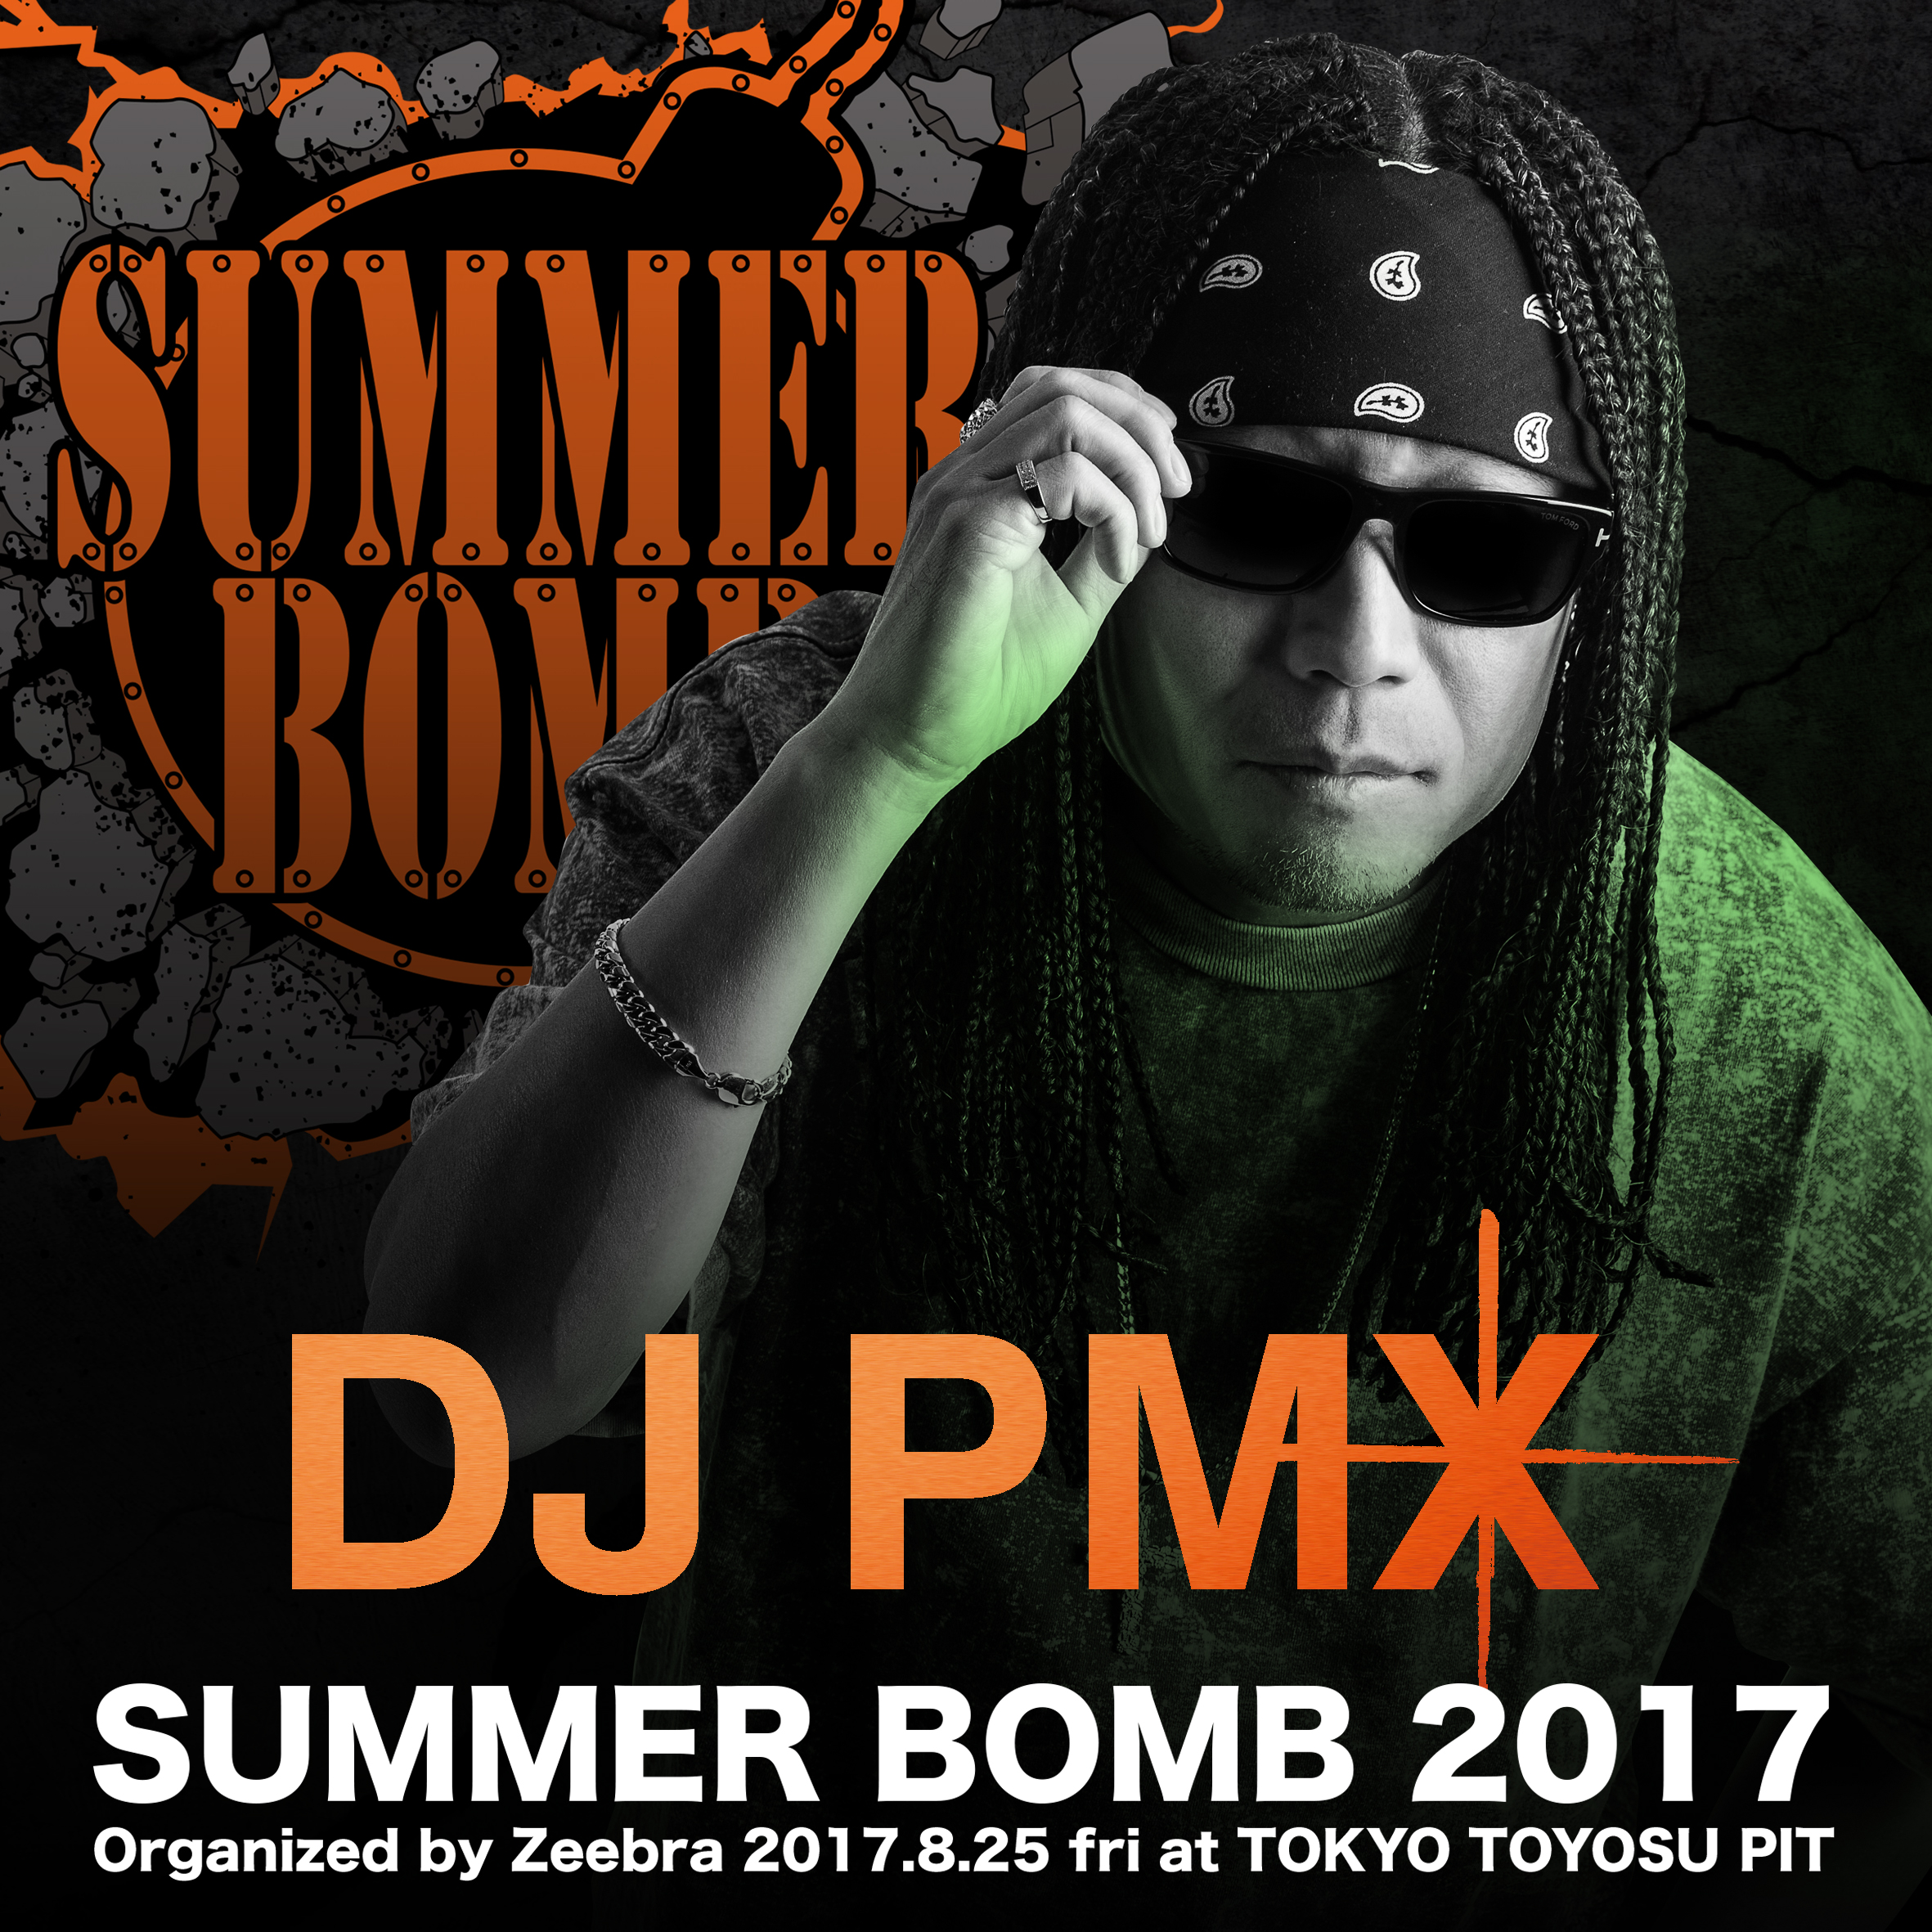 SB_2017_BN_DJPMX.jpg